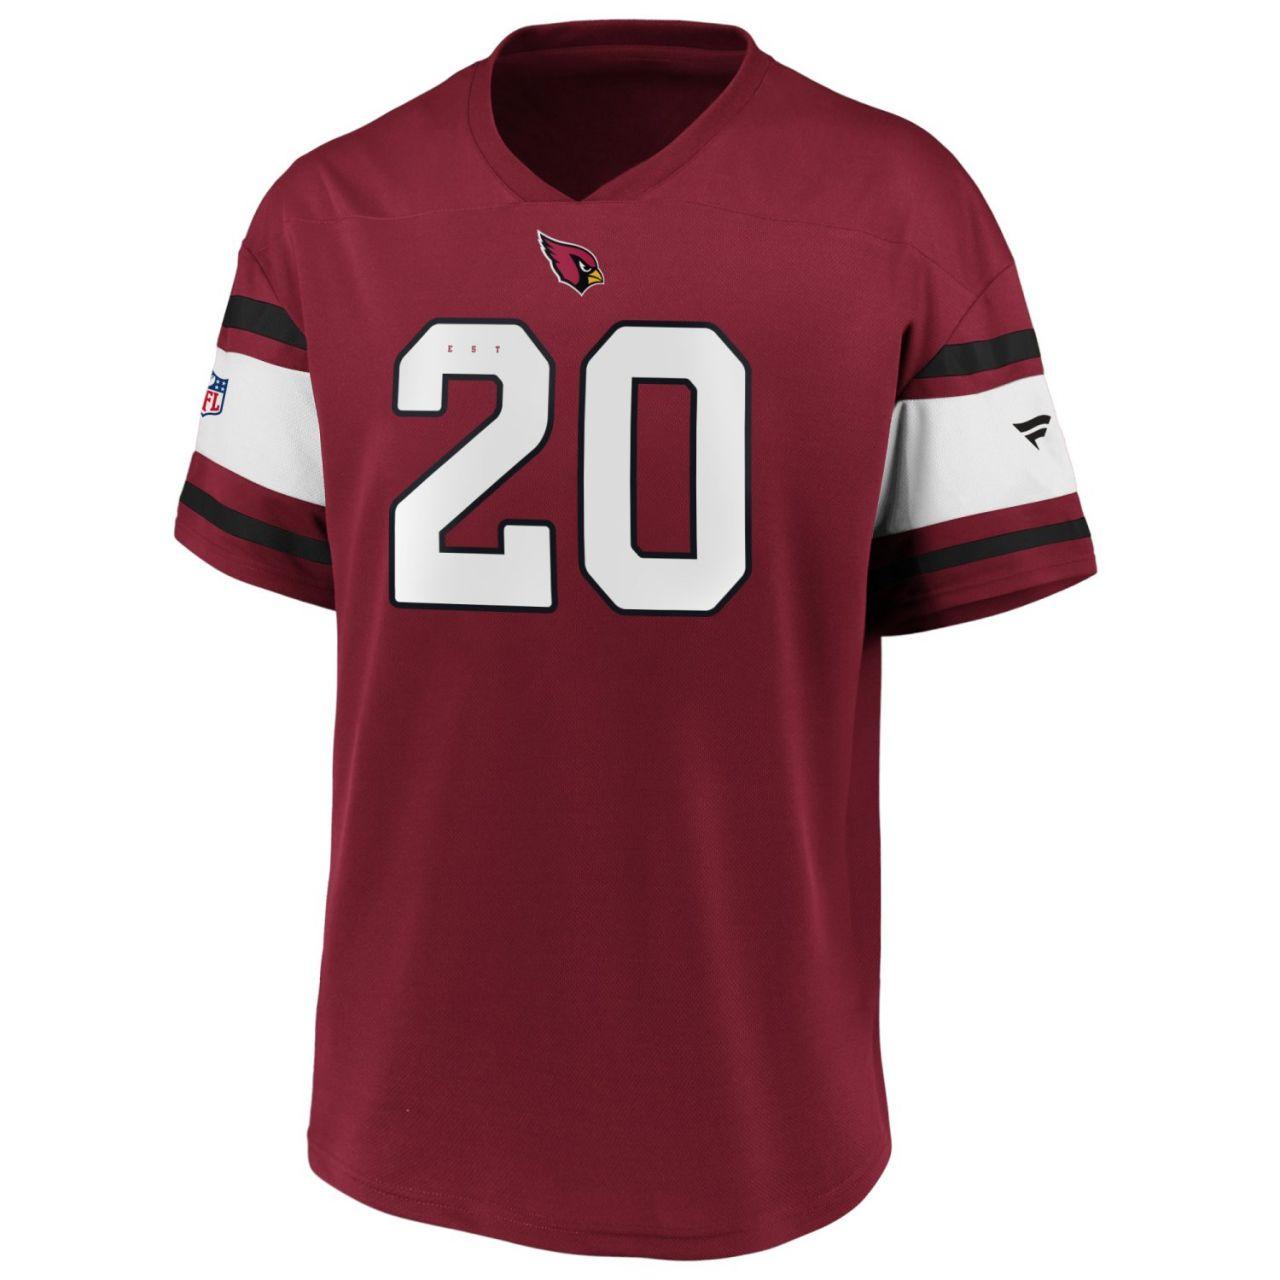 amfoo - Iconic Poly Mesh Supporters Jersey - Arizona Cardinals